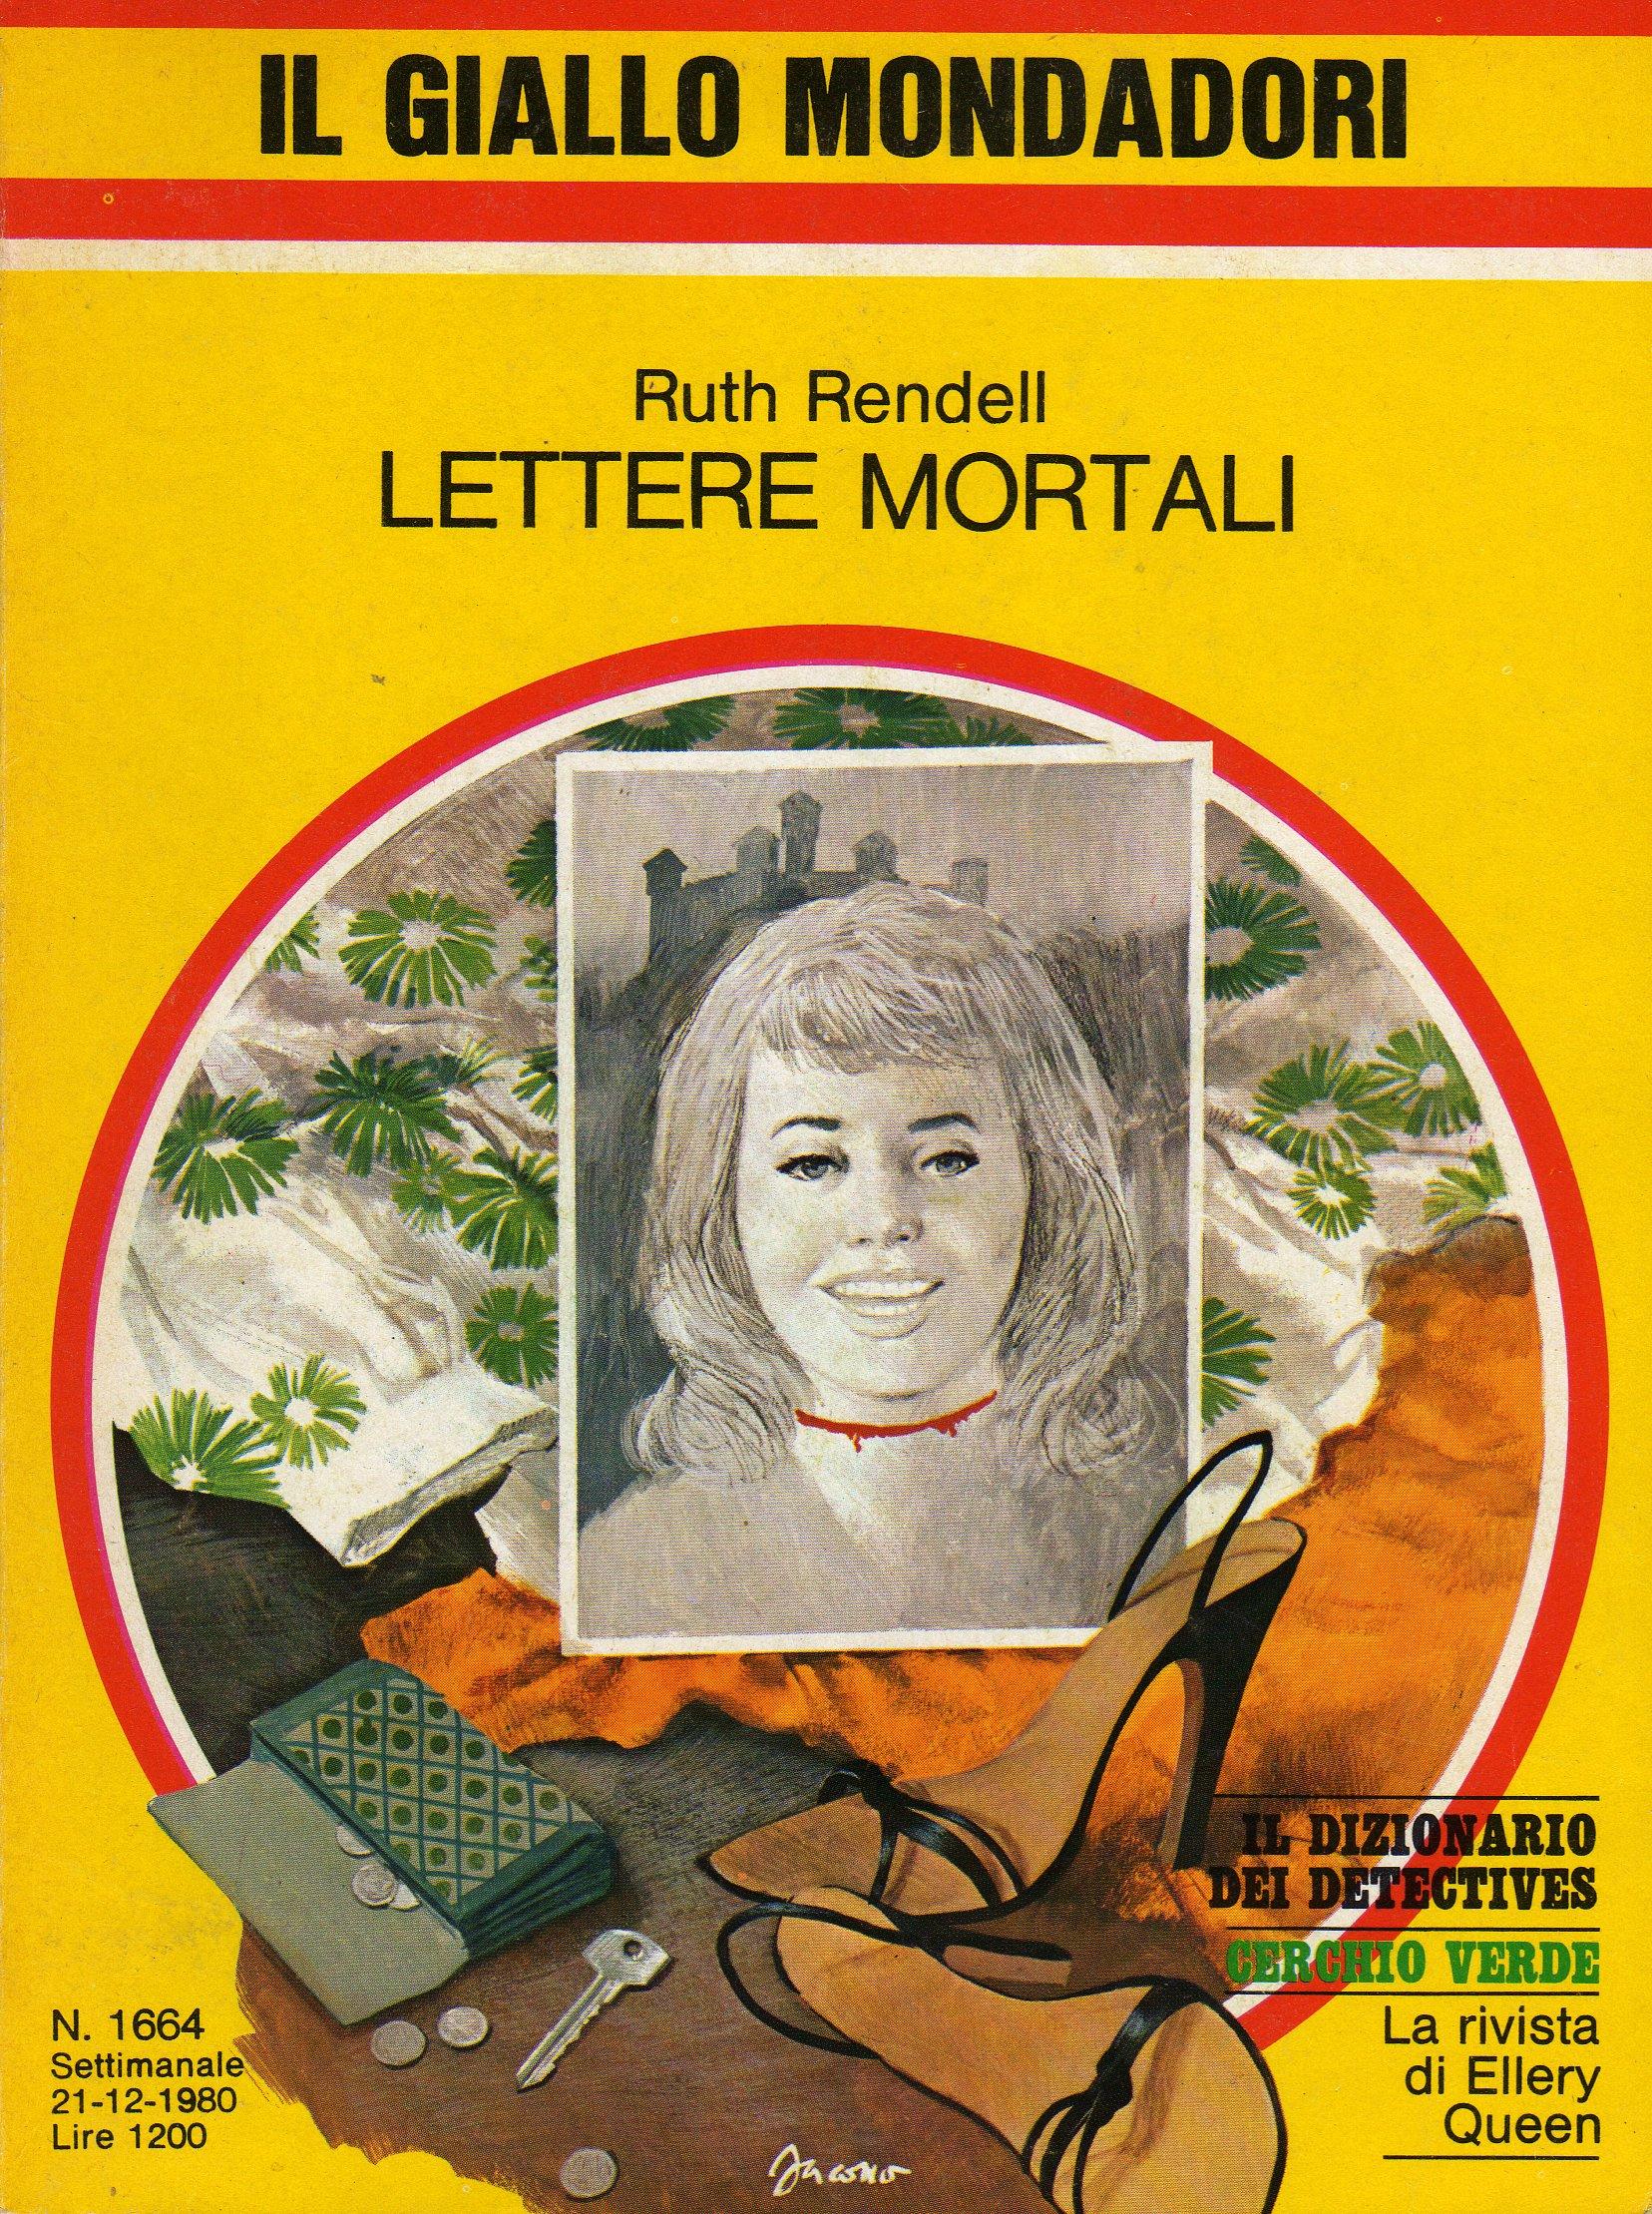 Segnale Ruth Rendell - Libro Mondadori